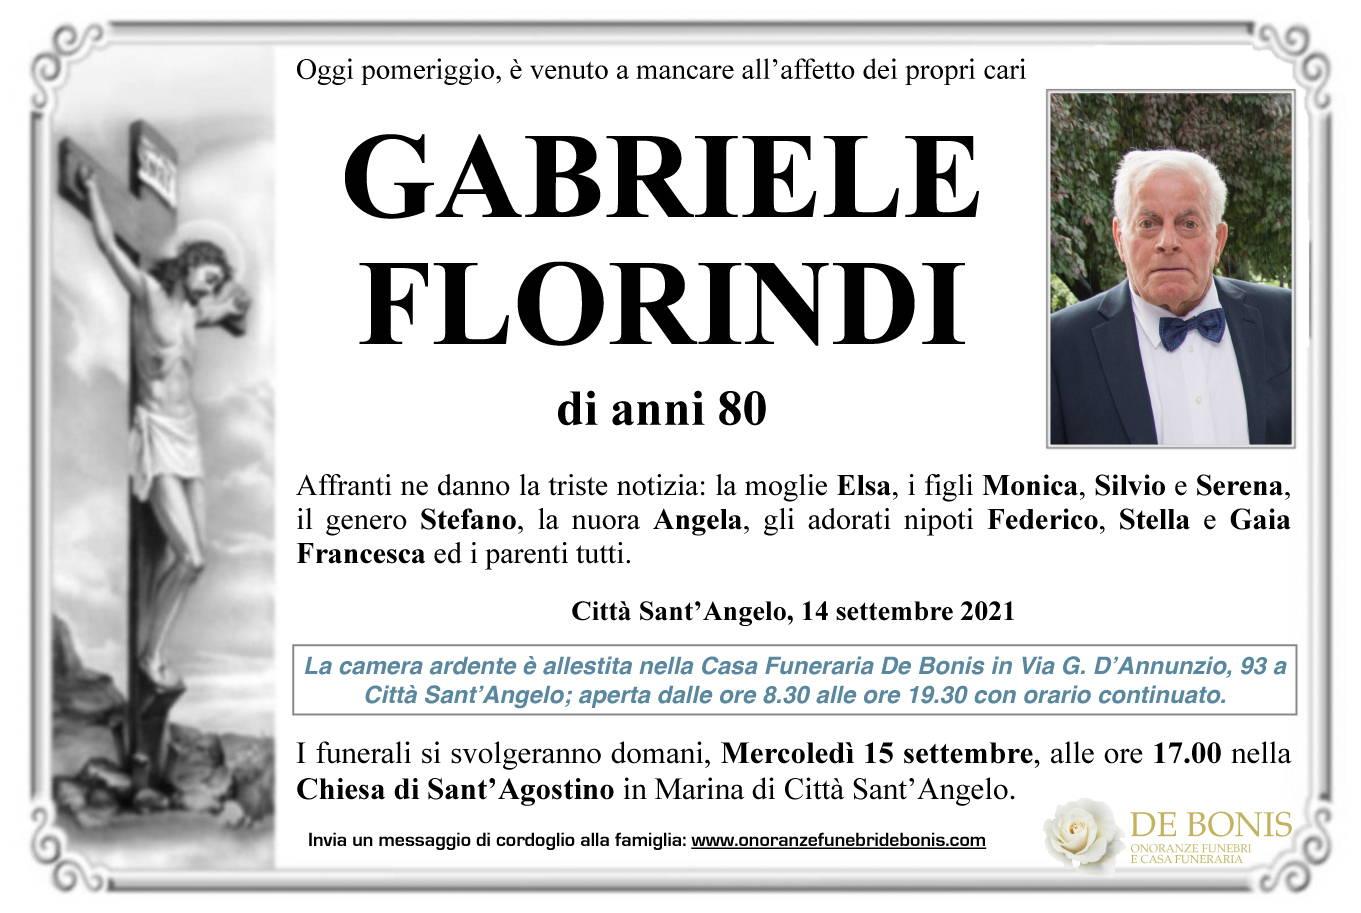 Gabriele Florindi